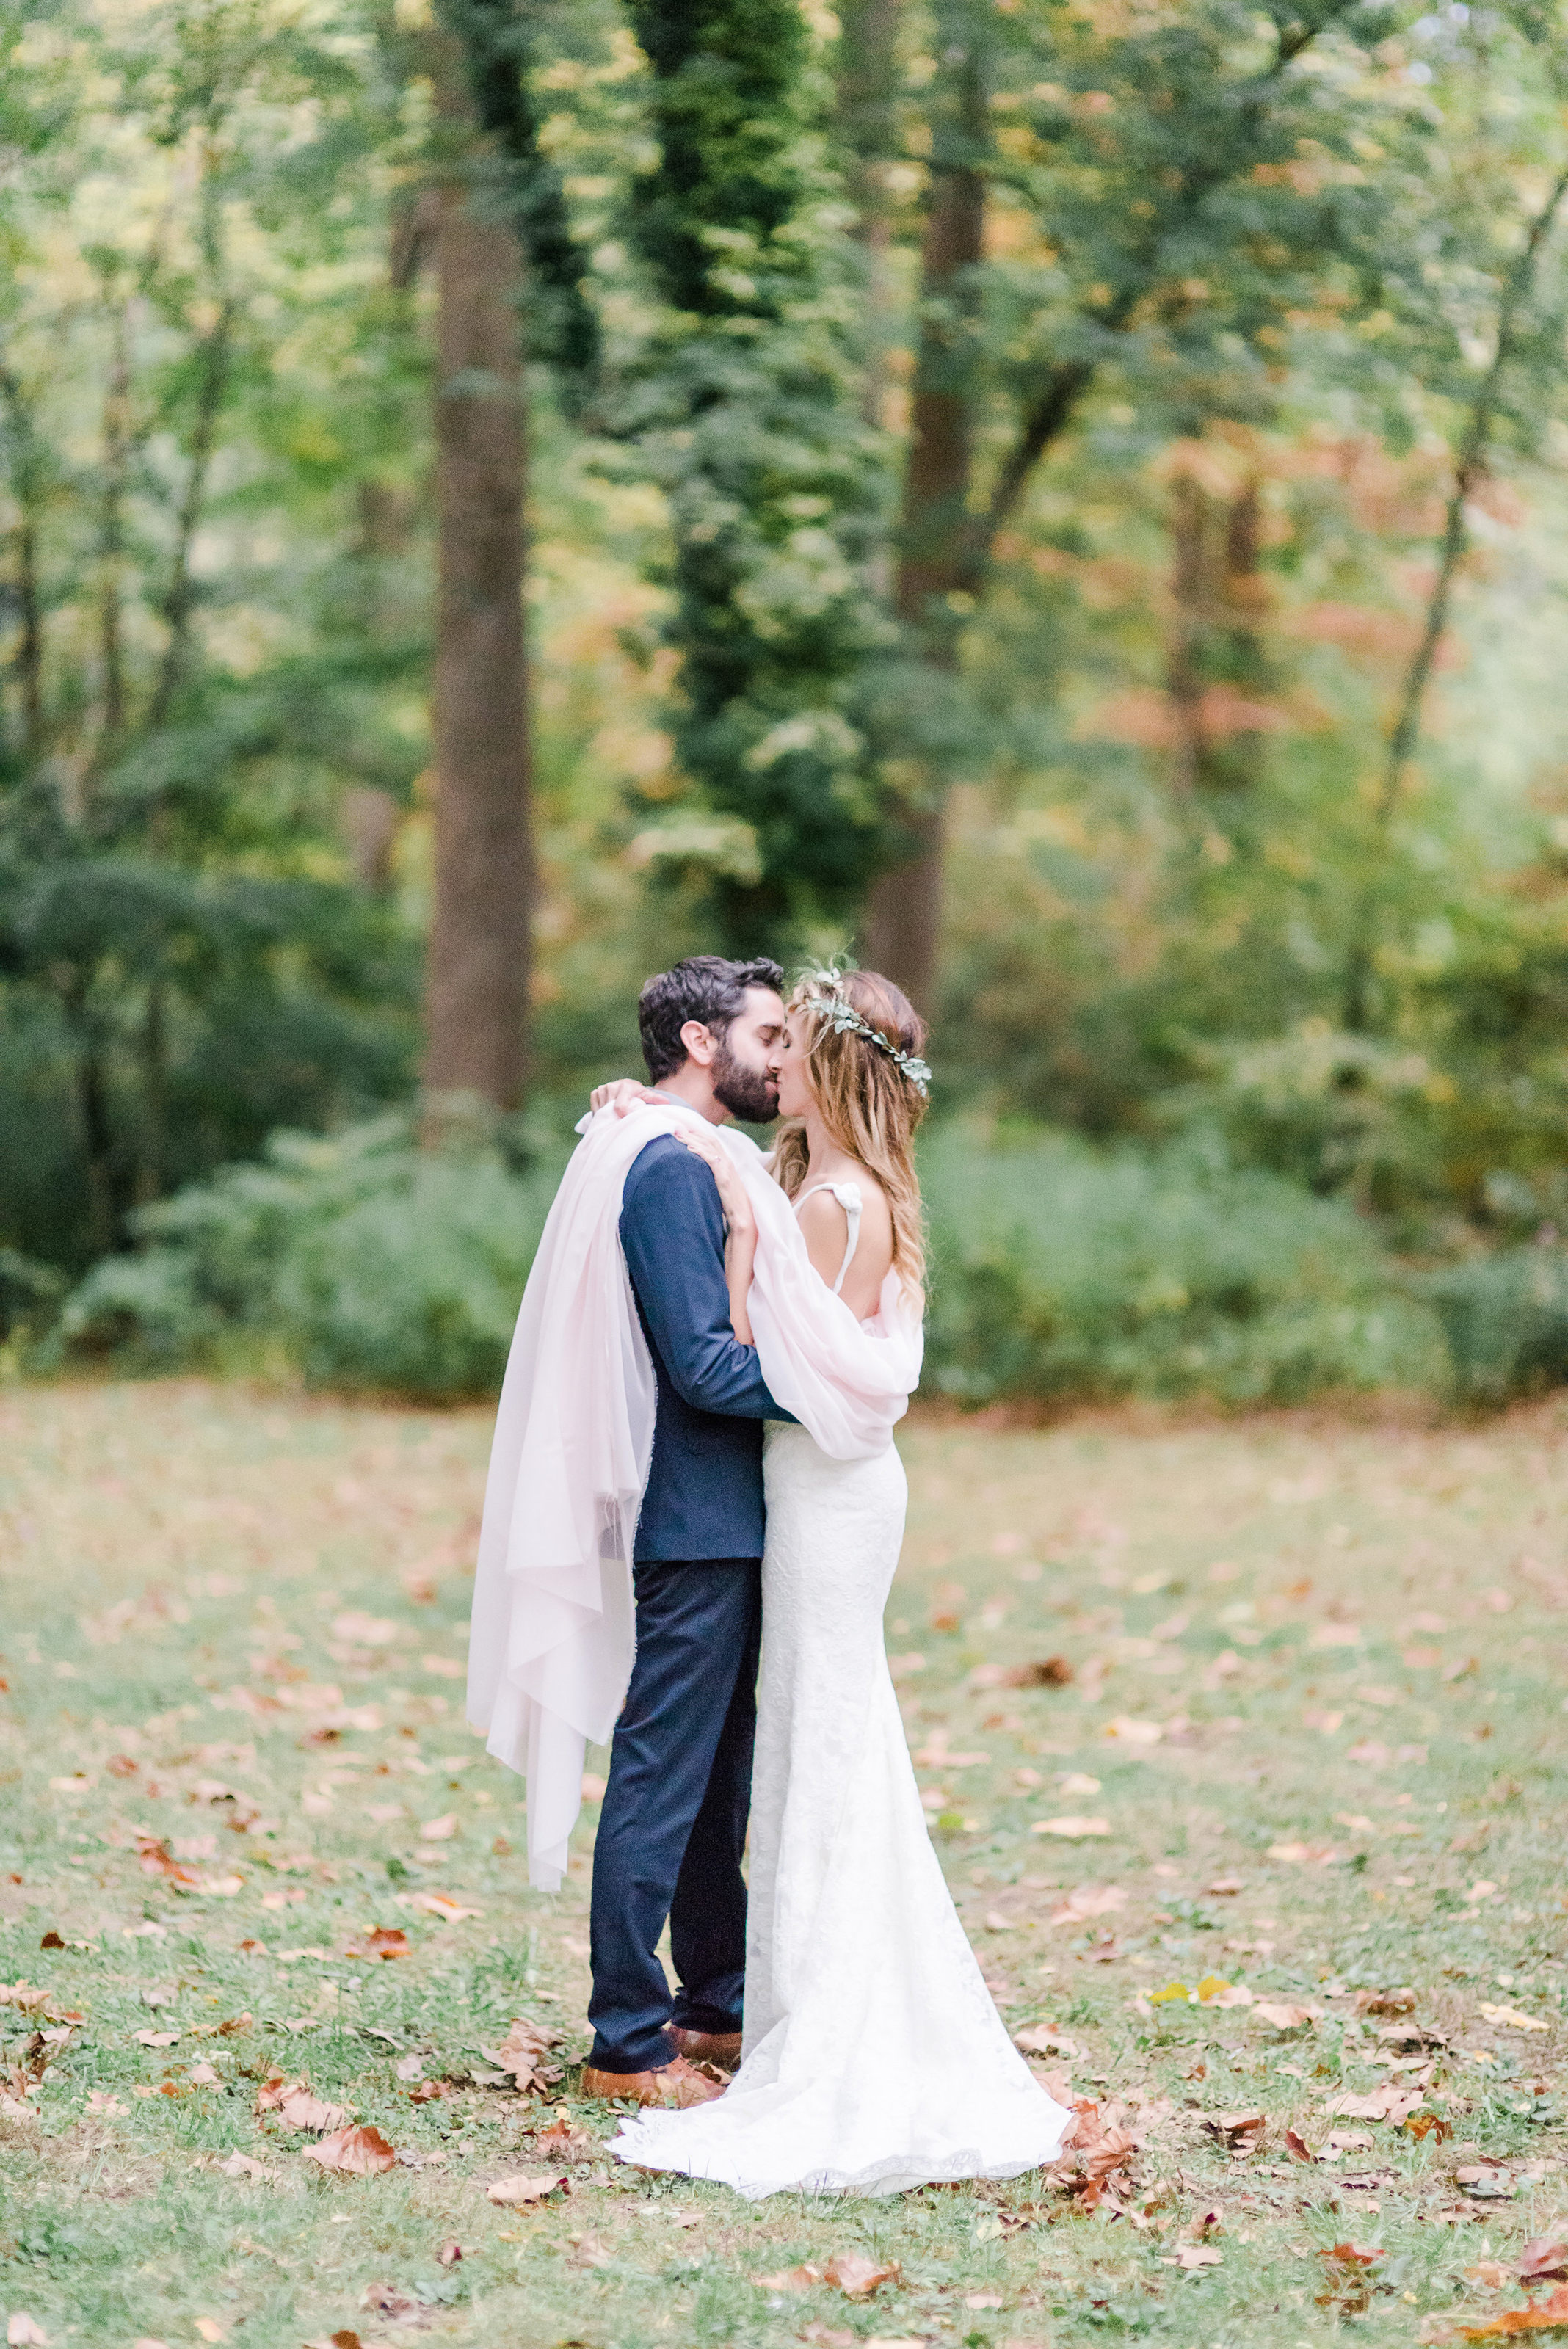 Blush Romantic Shoot Details-0303.jpg